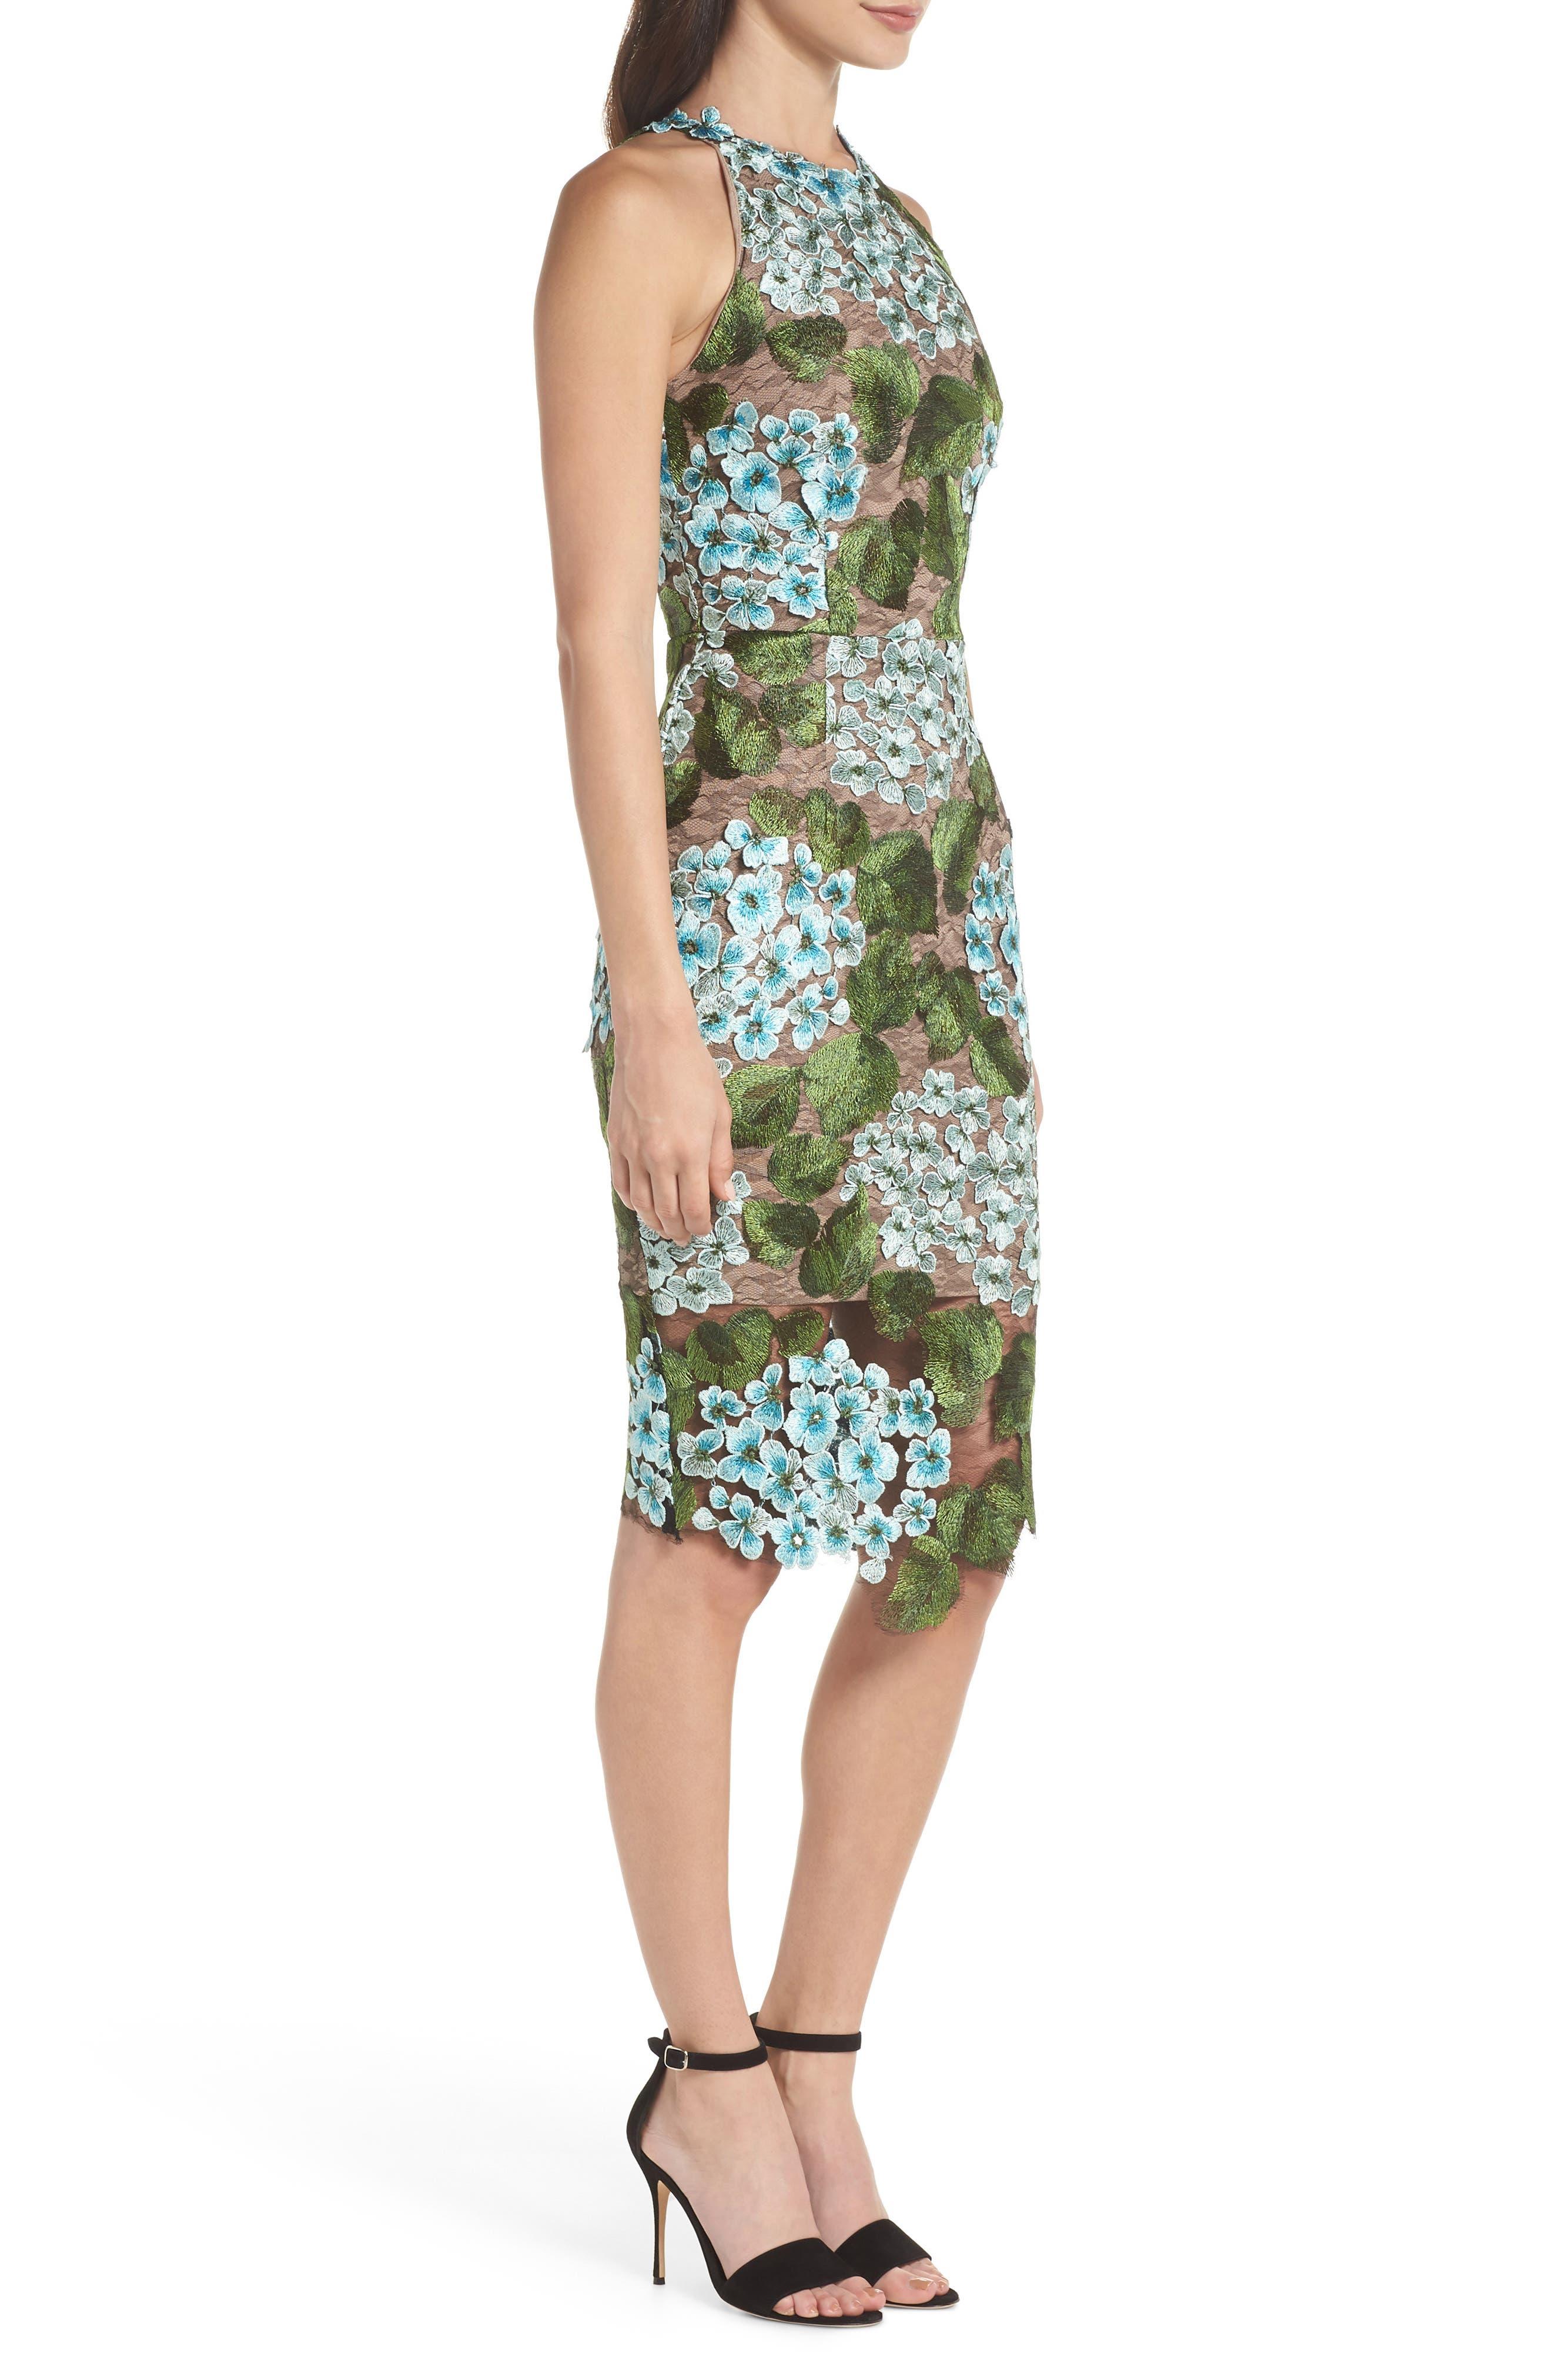 Blue Cherry Hydrangea Lace Sheath Dress,                             Alternate thumbnail 3, color,                             Multicolor